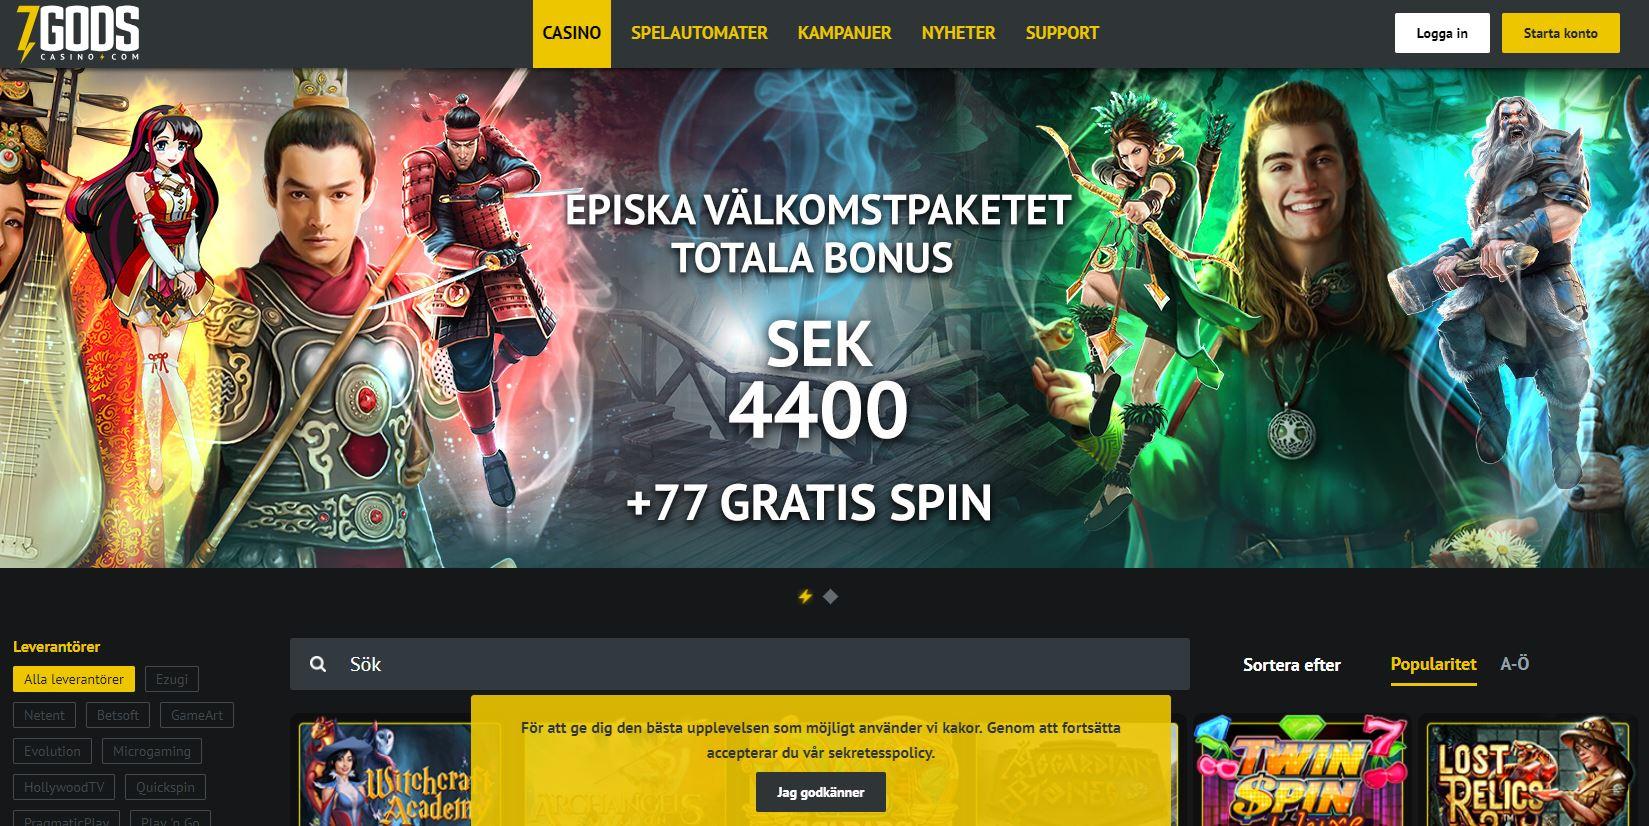 Gold Stream Casino N/D - No Deposit Casinos - Latest Poker Bonuses